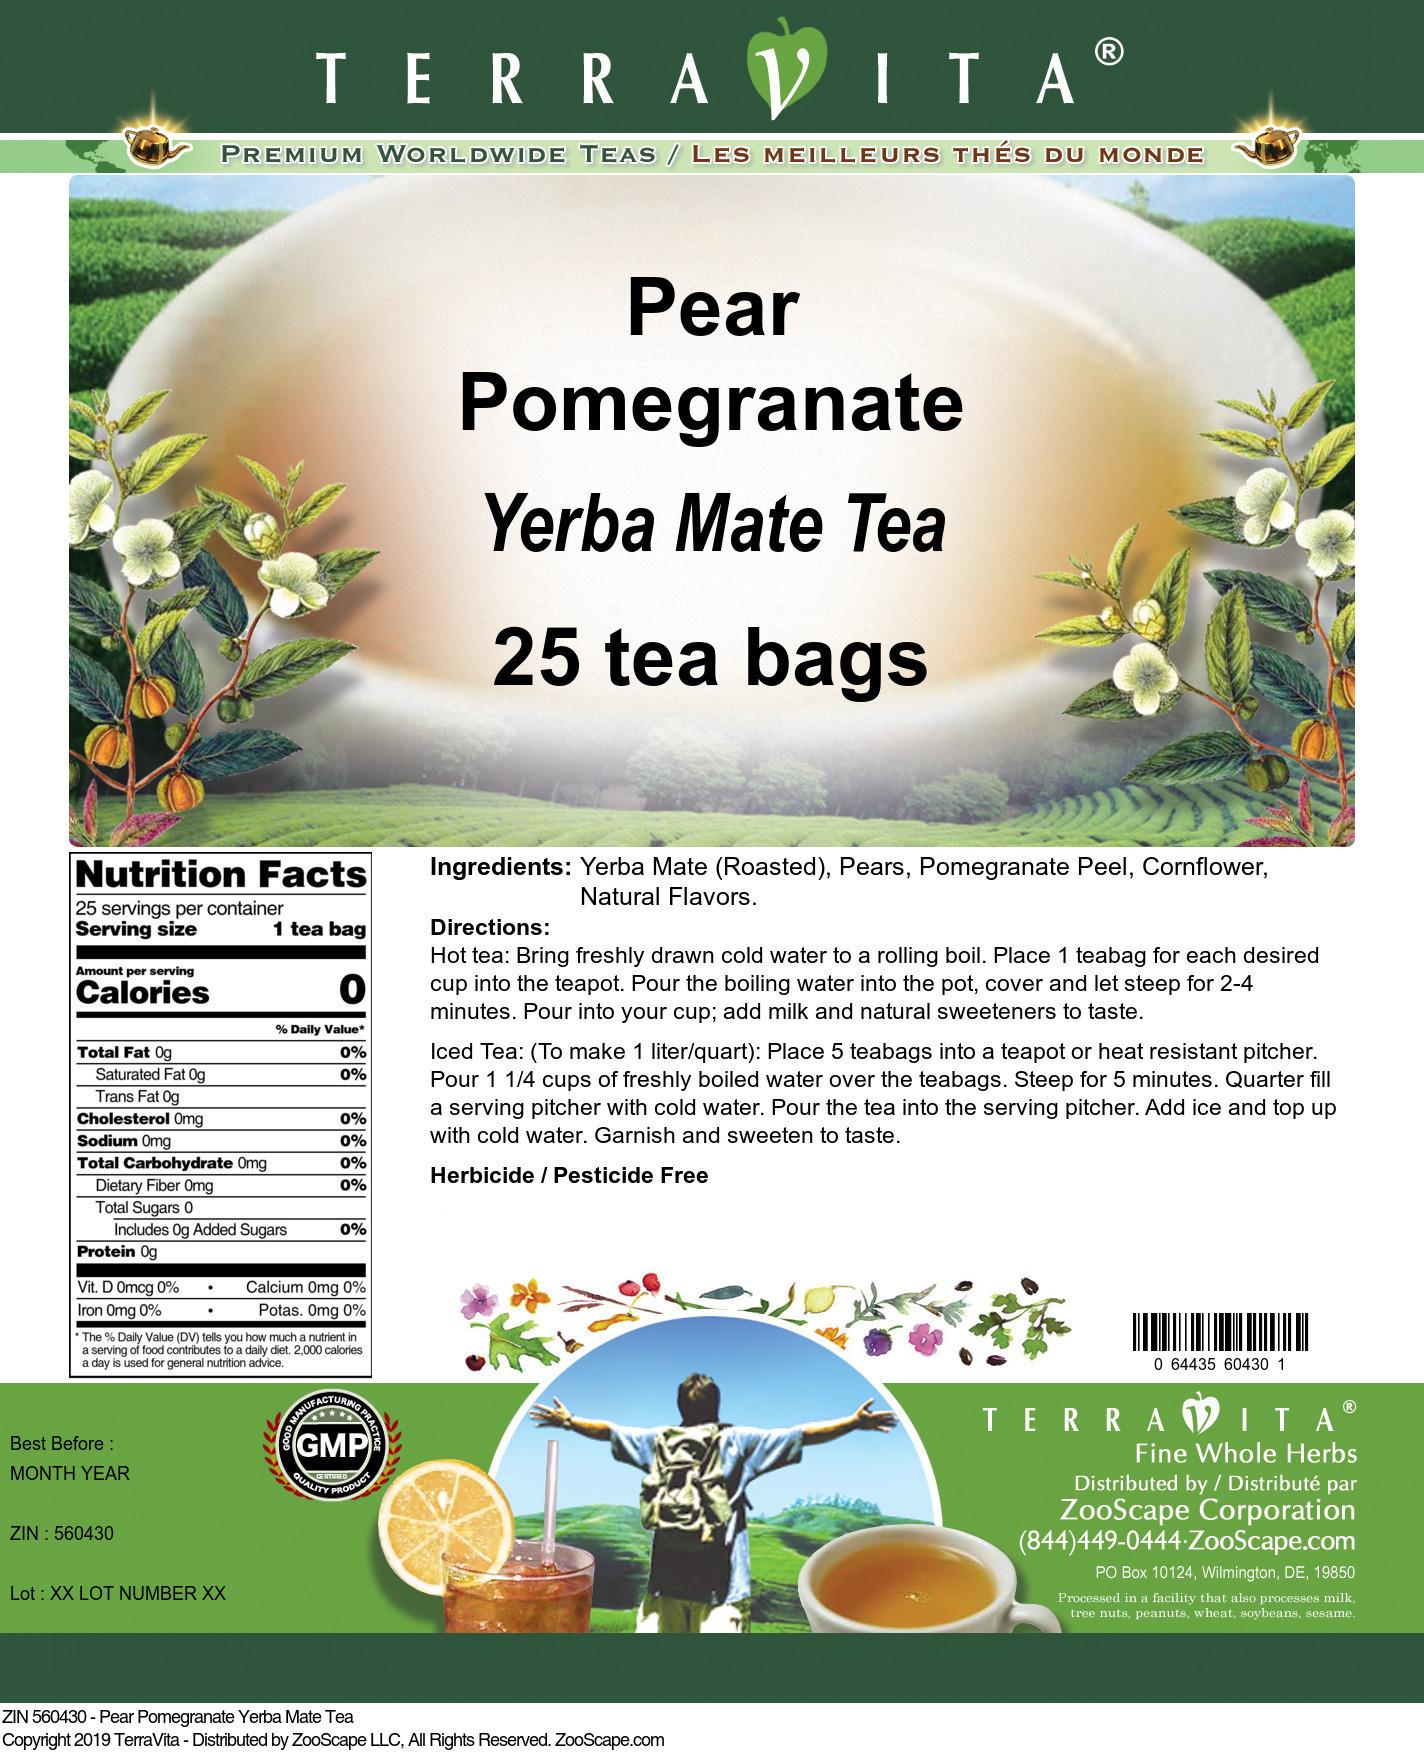 Pear Pomegranate Yerba Mate